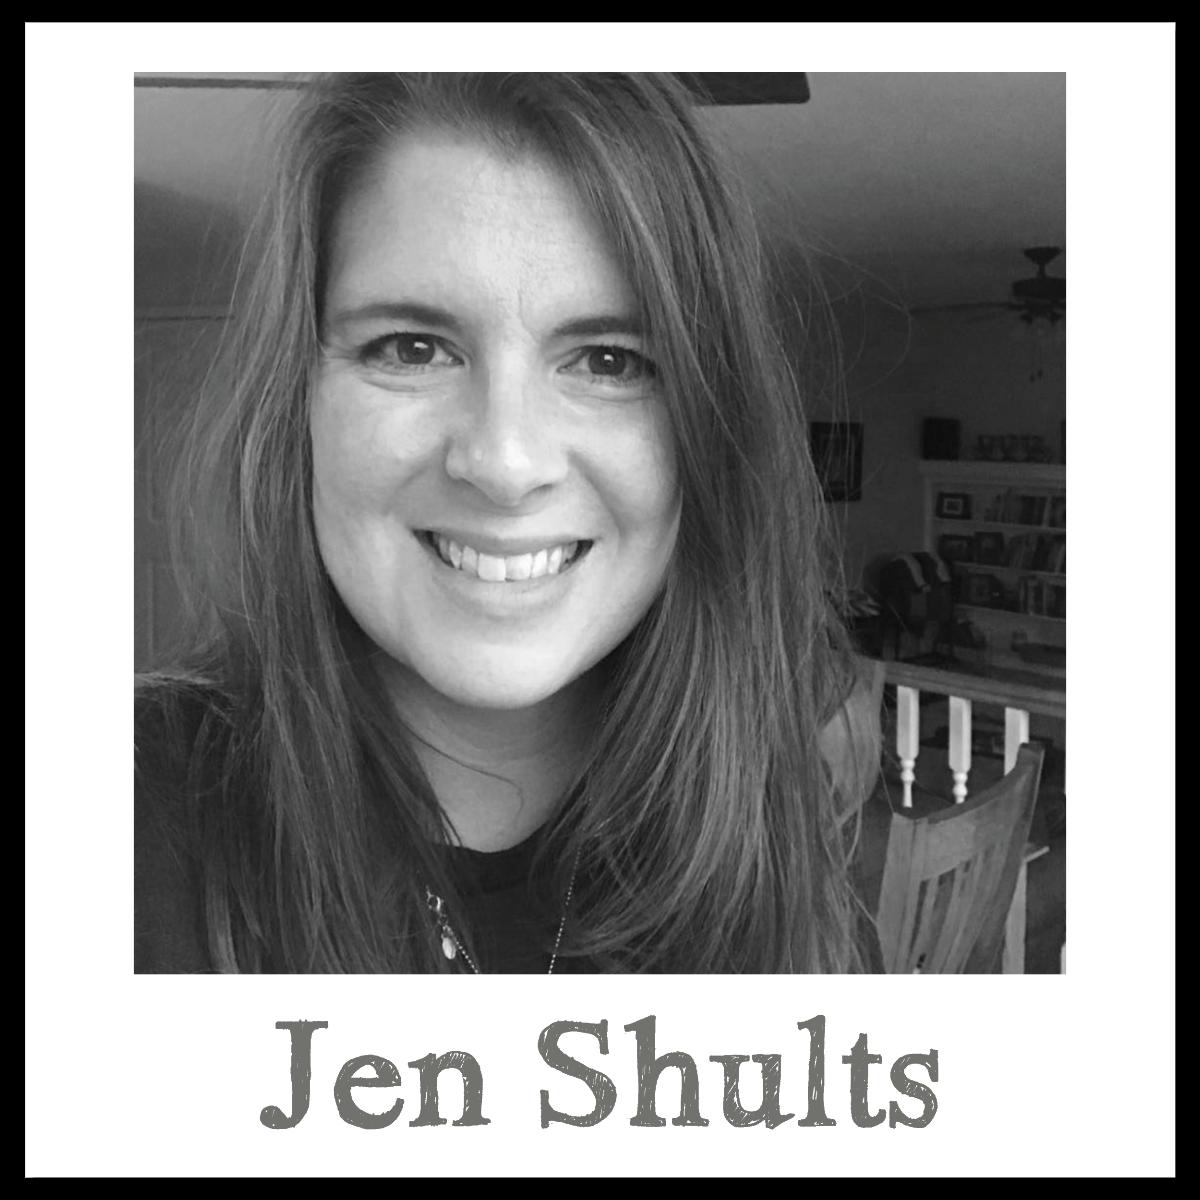 Jen Shults